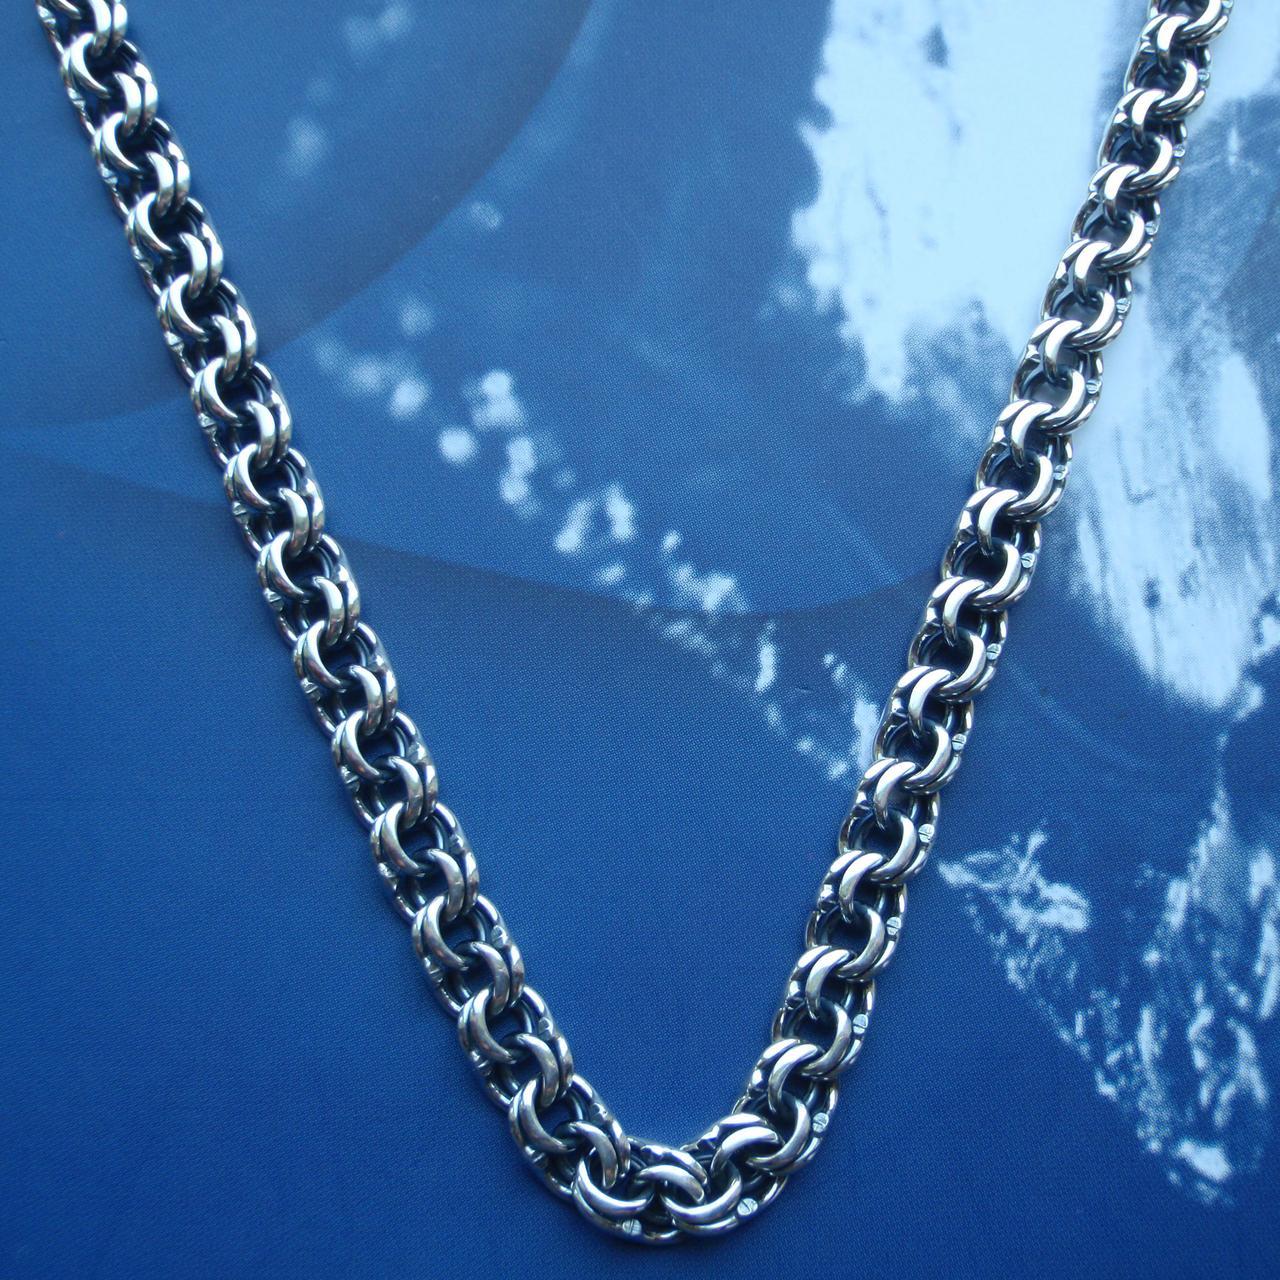 Серебряная цепочка, 600мм, 39 грамм, плетение Бисмарк